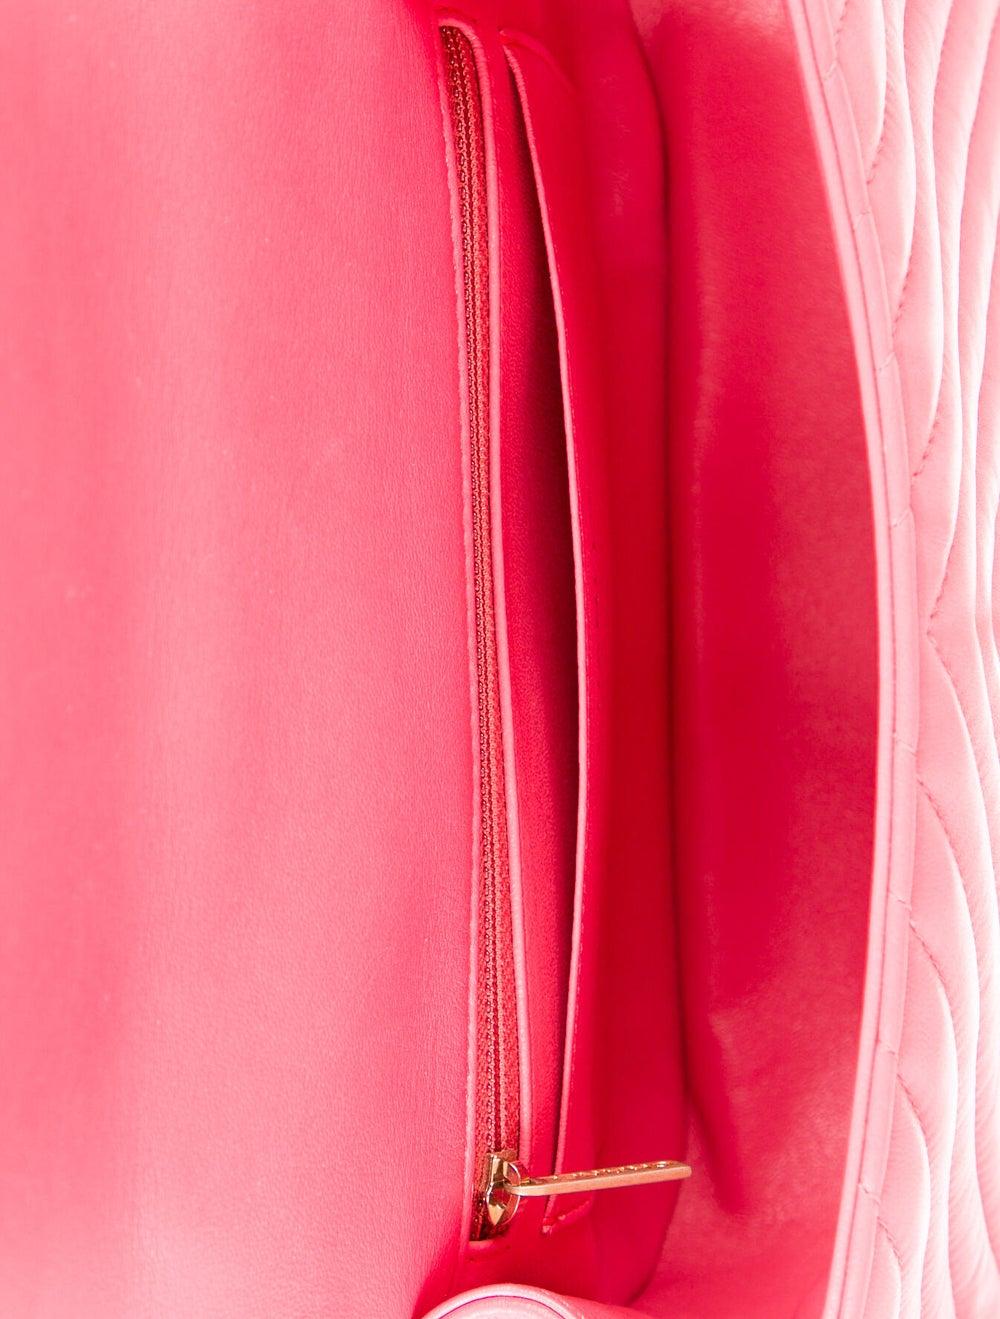 Chanel Reversed Chevron Bag Pink - image 5